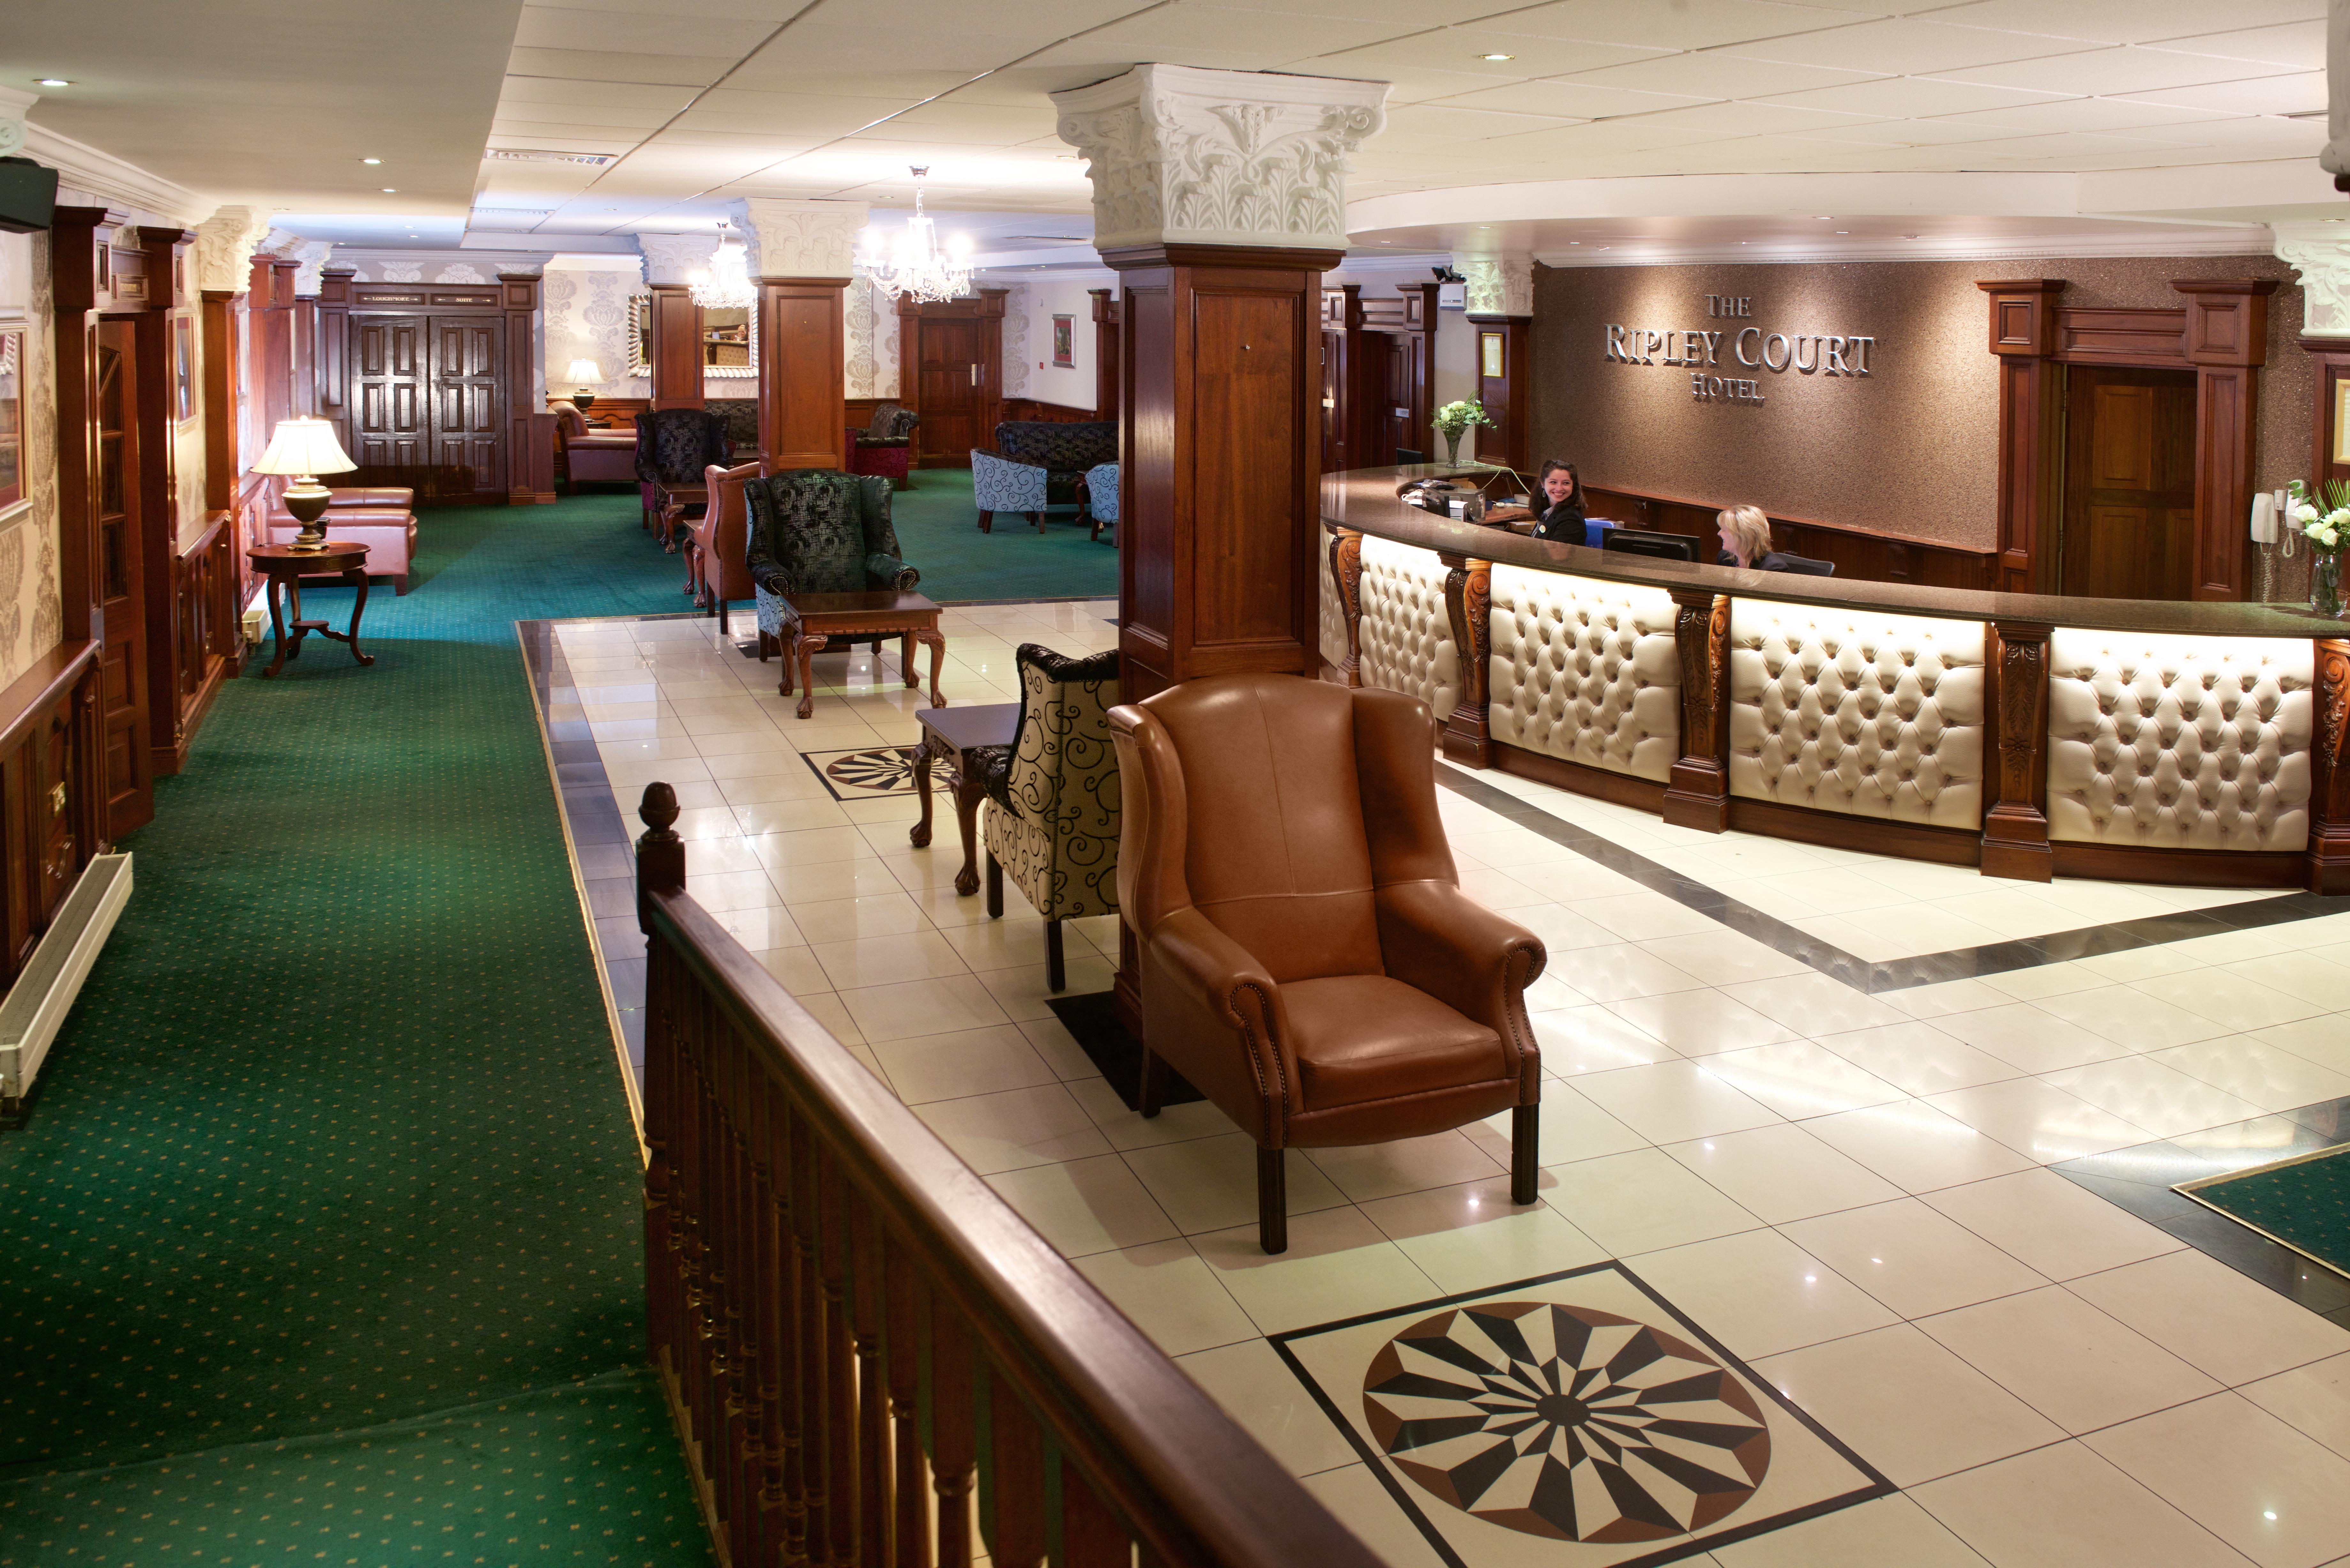 The Ripley Court Hotel In Dublin City Centre Ireland